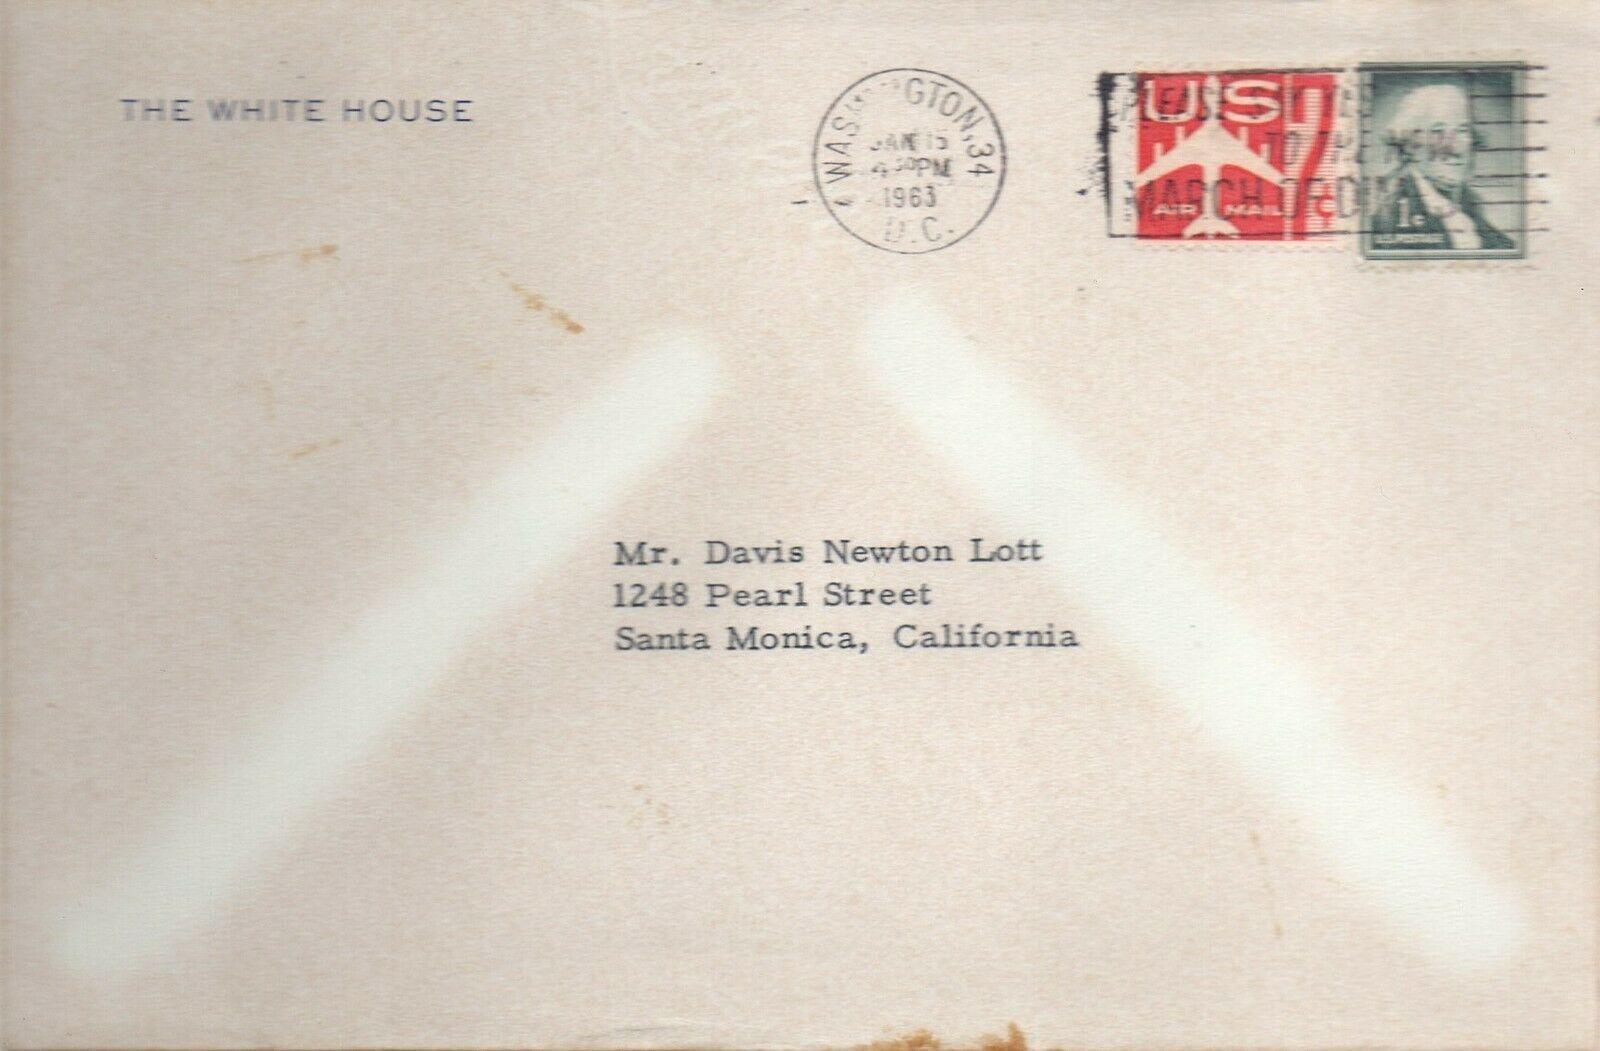 JOHN F. KENNEDY Signed White House letter& envelope. Jan 14,1963. Fine autograph image 2